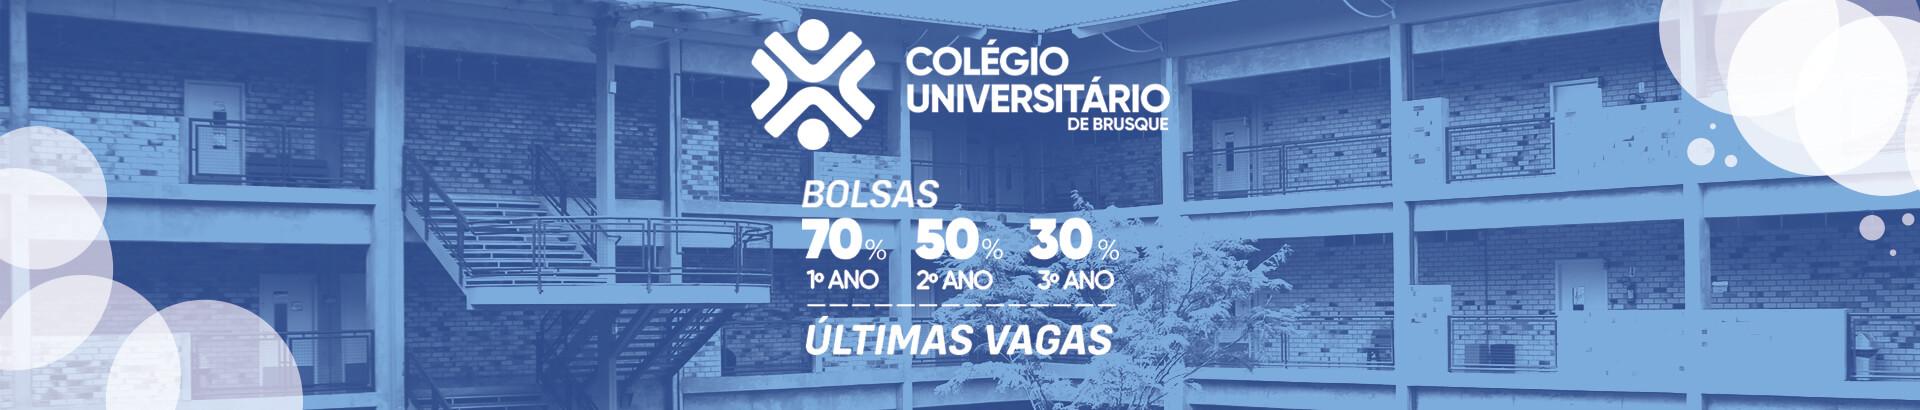 banner-site-1920x410-desktop-COLÉGIO UNIVERSITÁRIO(1)